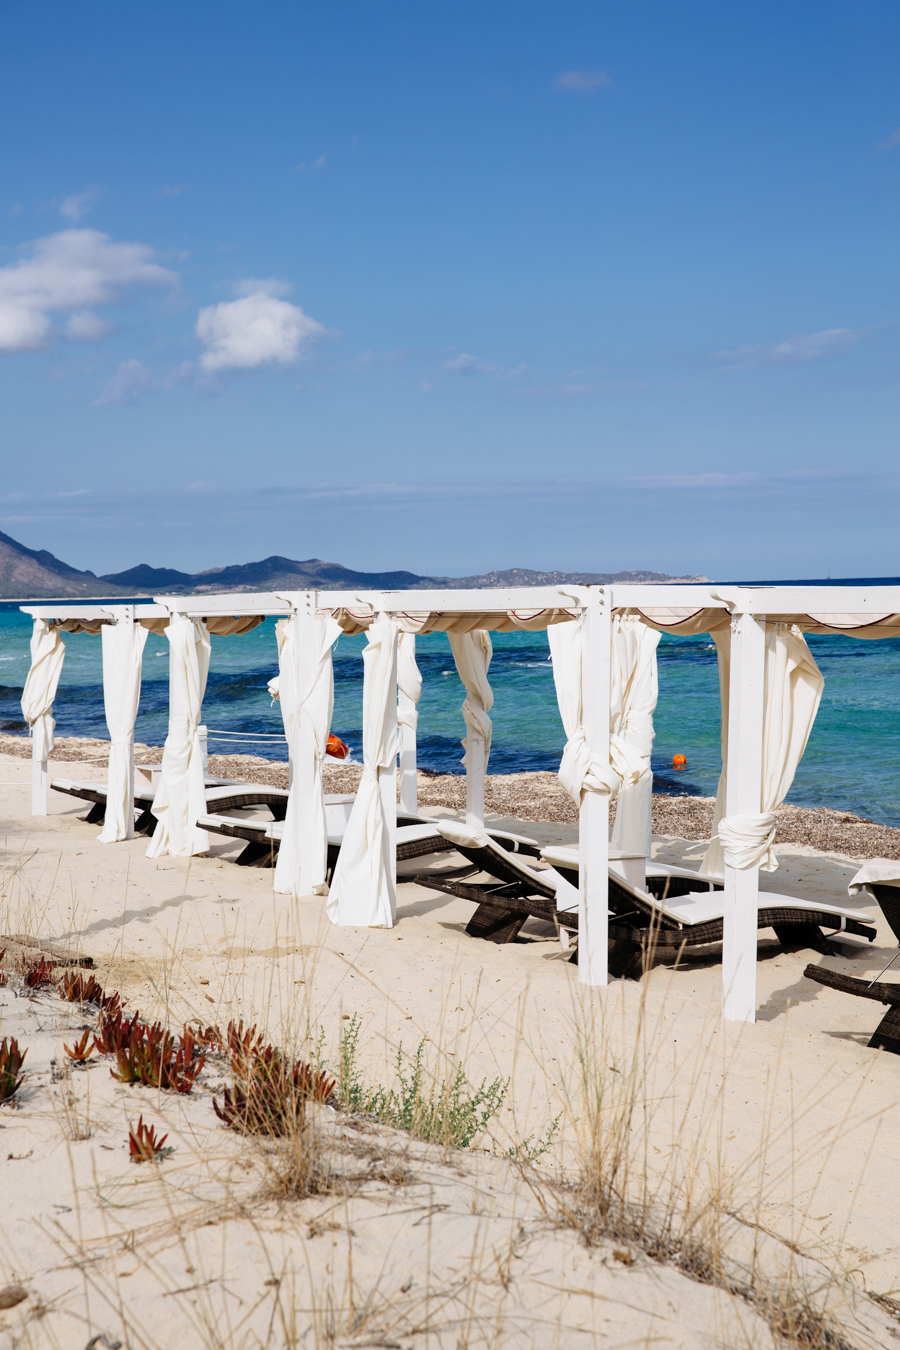 Sardinien Italien Urlaub-3.jpg